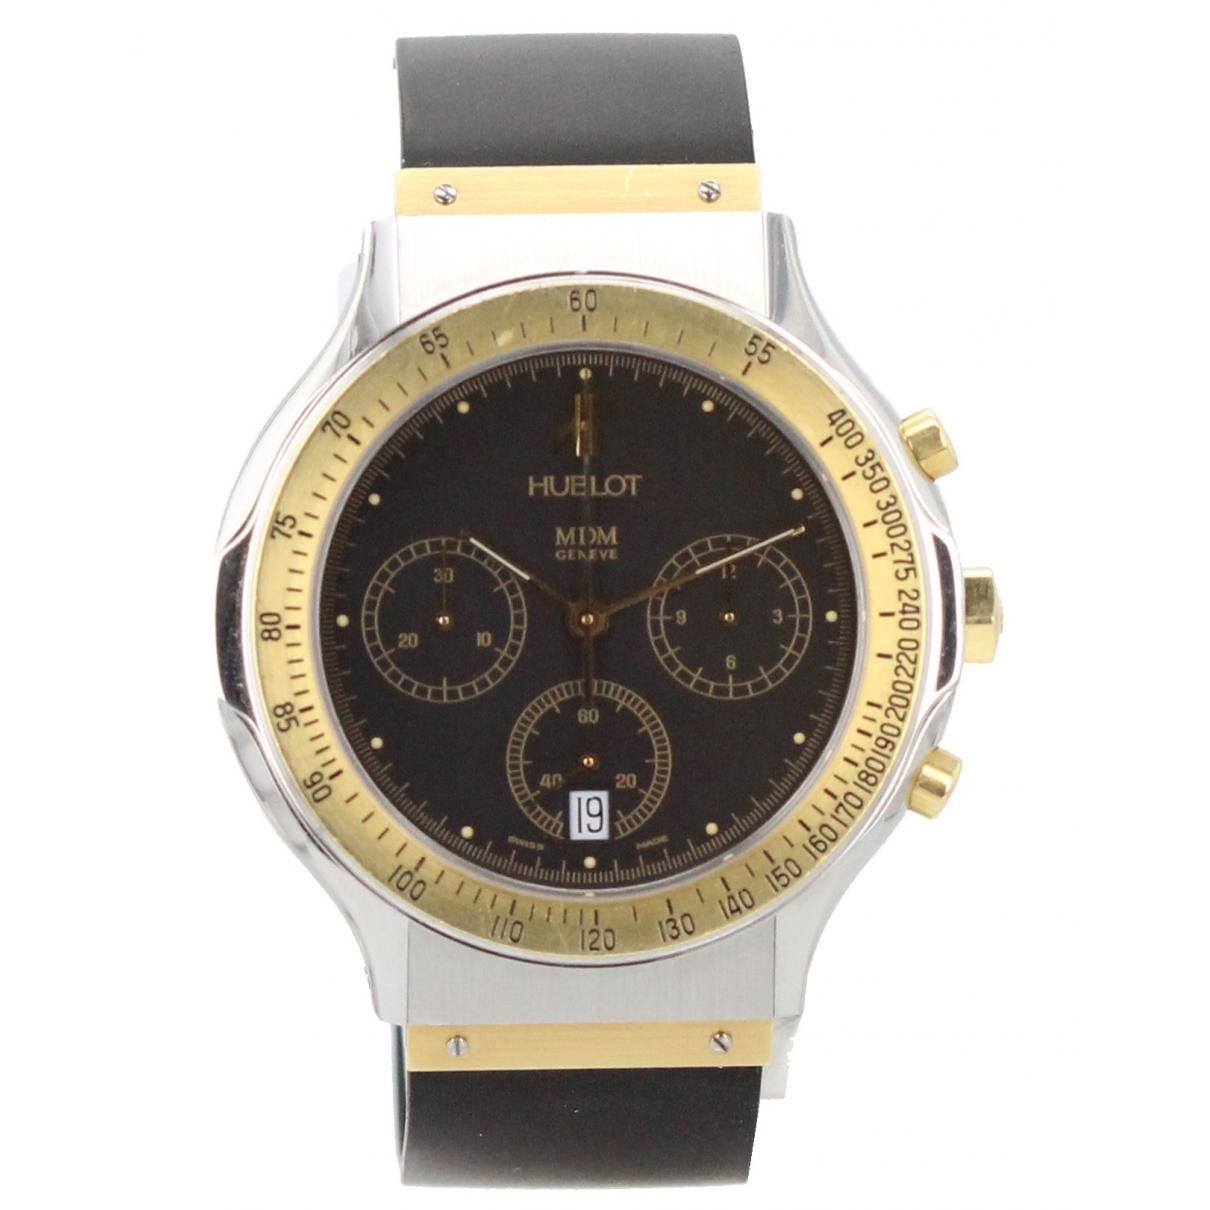 Hublot MDM Khaki gold and steel watch for Men \N